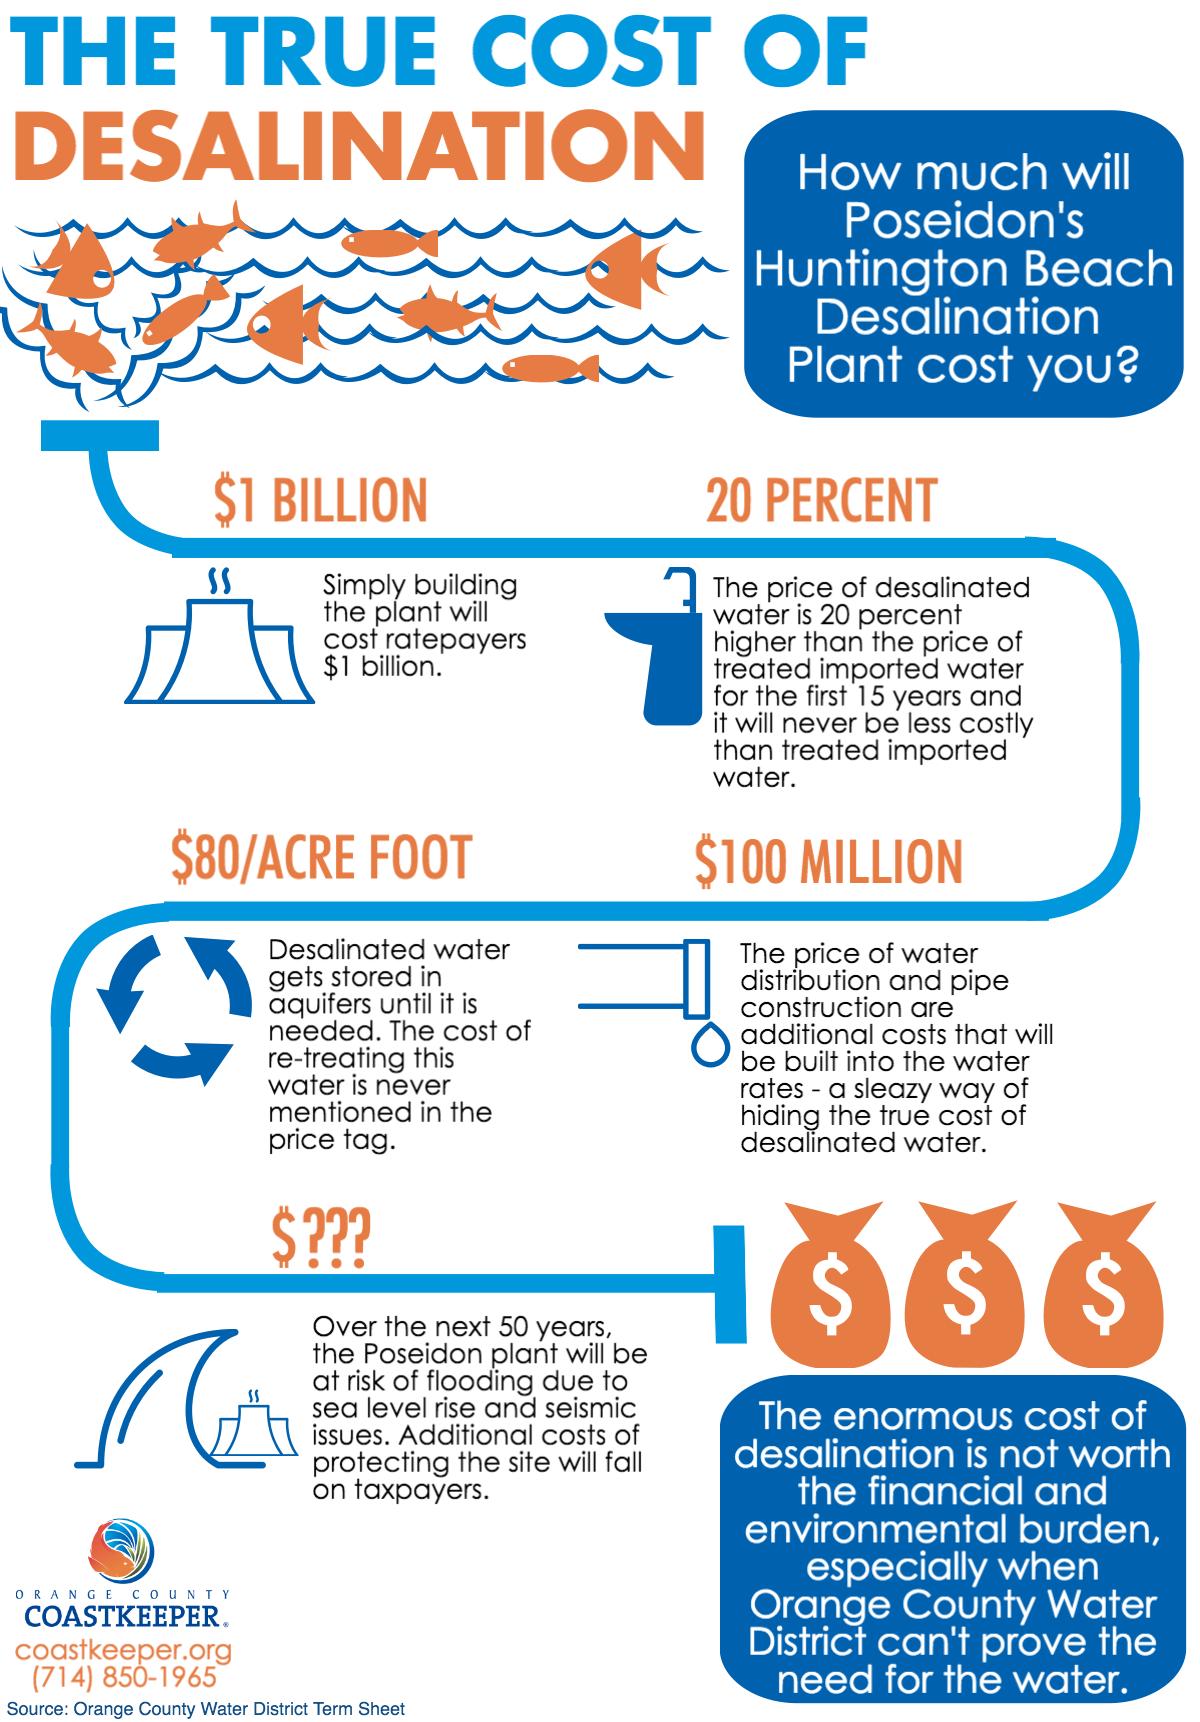 True Cost of Desalination in Orange County Orange County